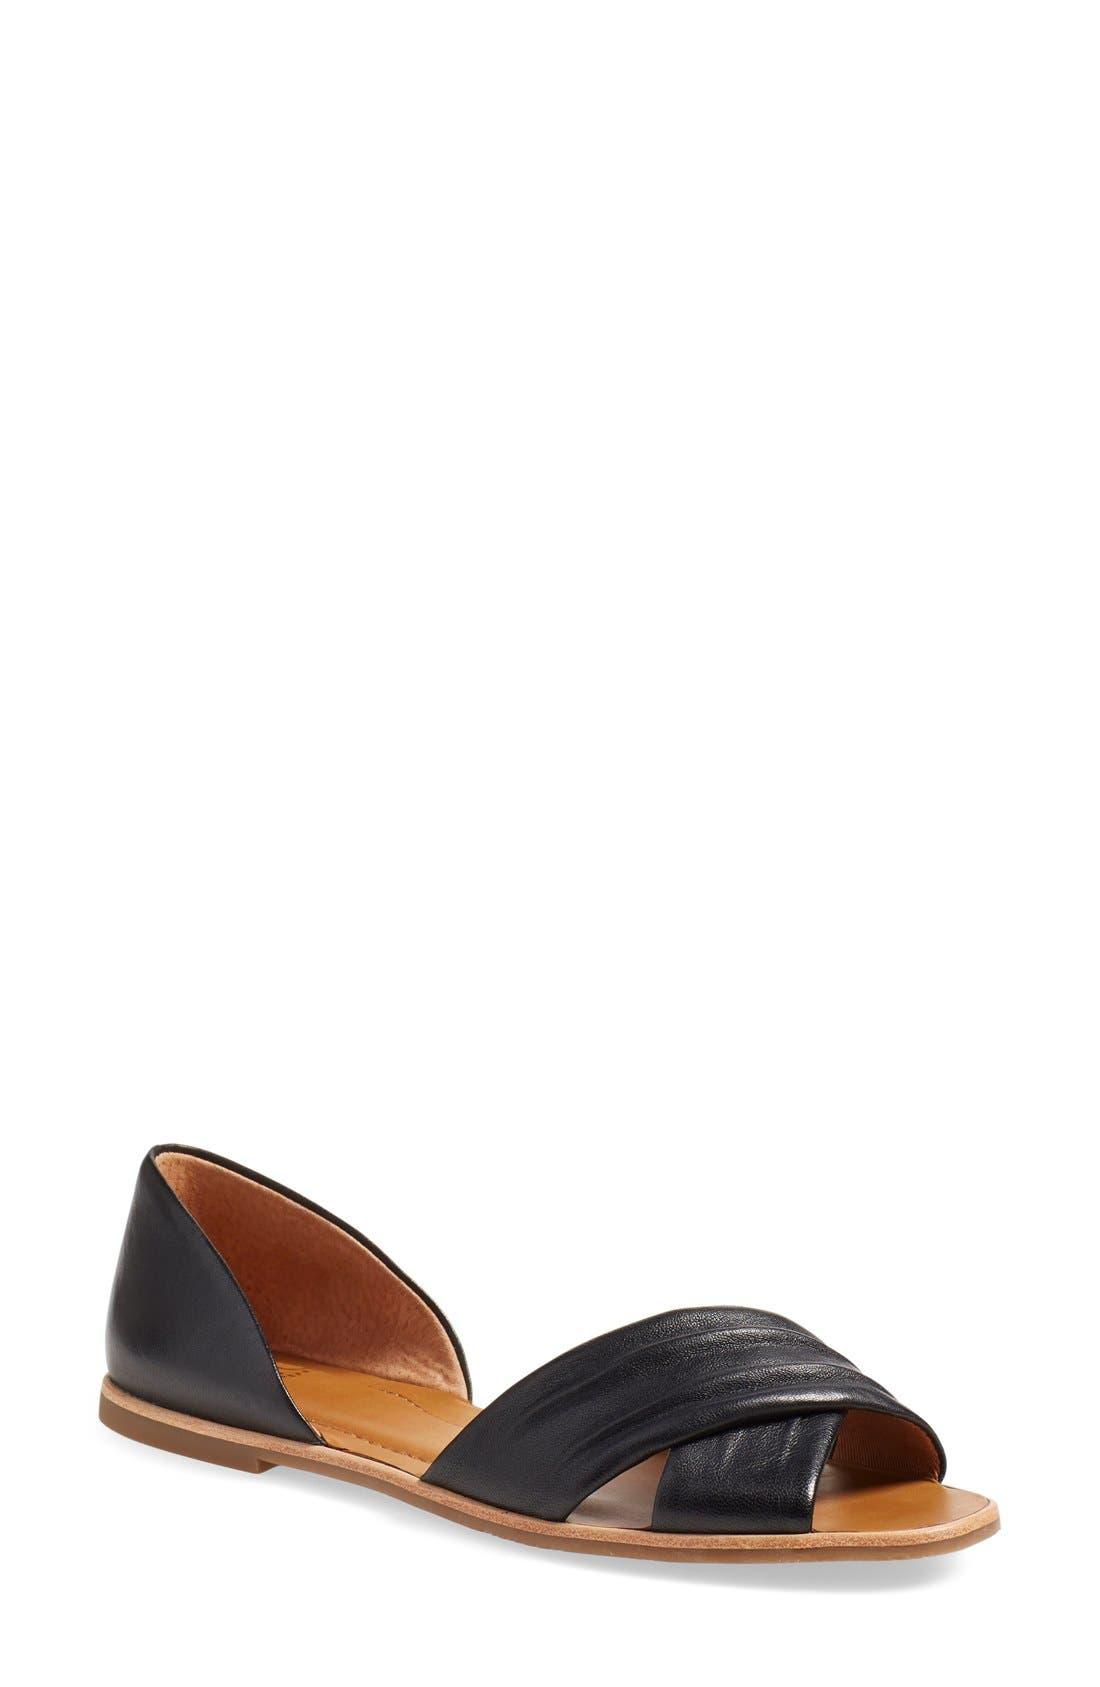 SARTO BY FRANCO SARTO 'Vala' Flat Sandal, Main, color, 001